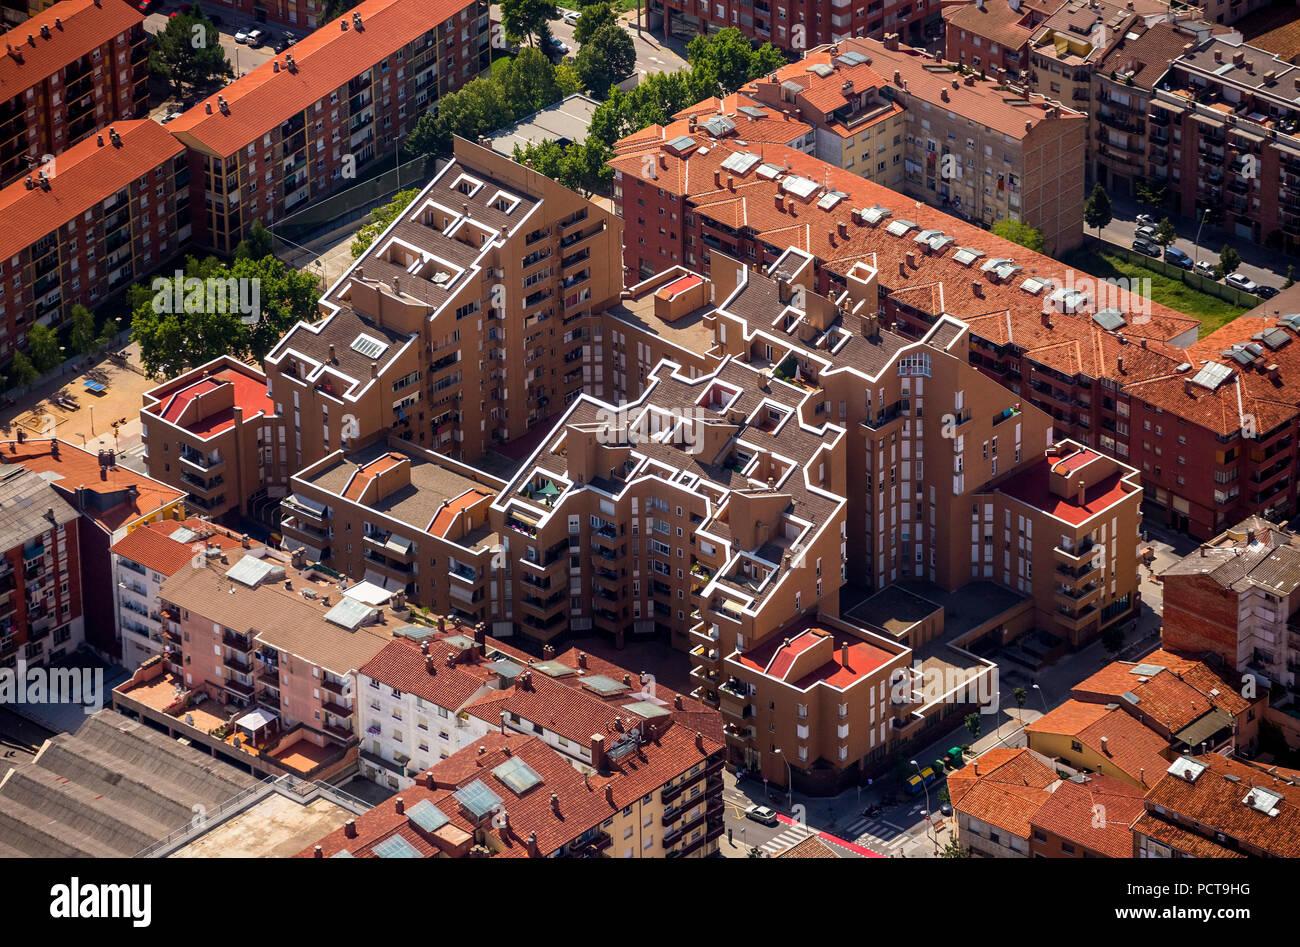 Multi-tiered house, Vic, Costa Brava, Catalonia, Spain - Stock Image